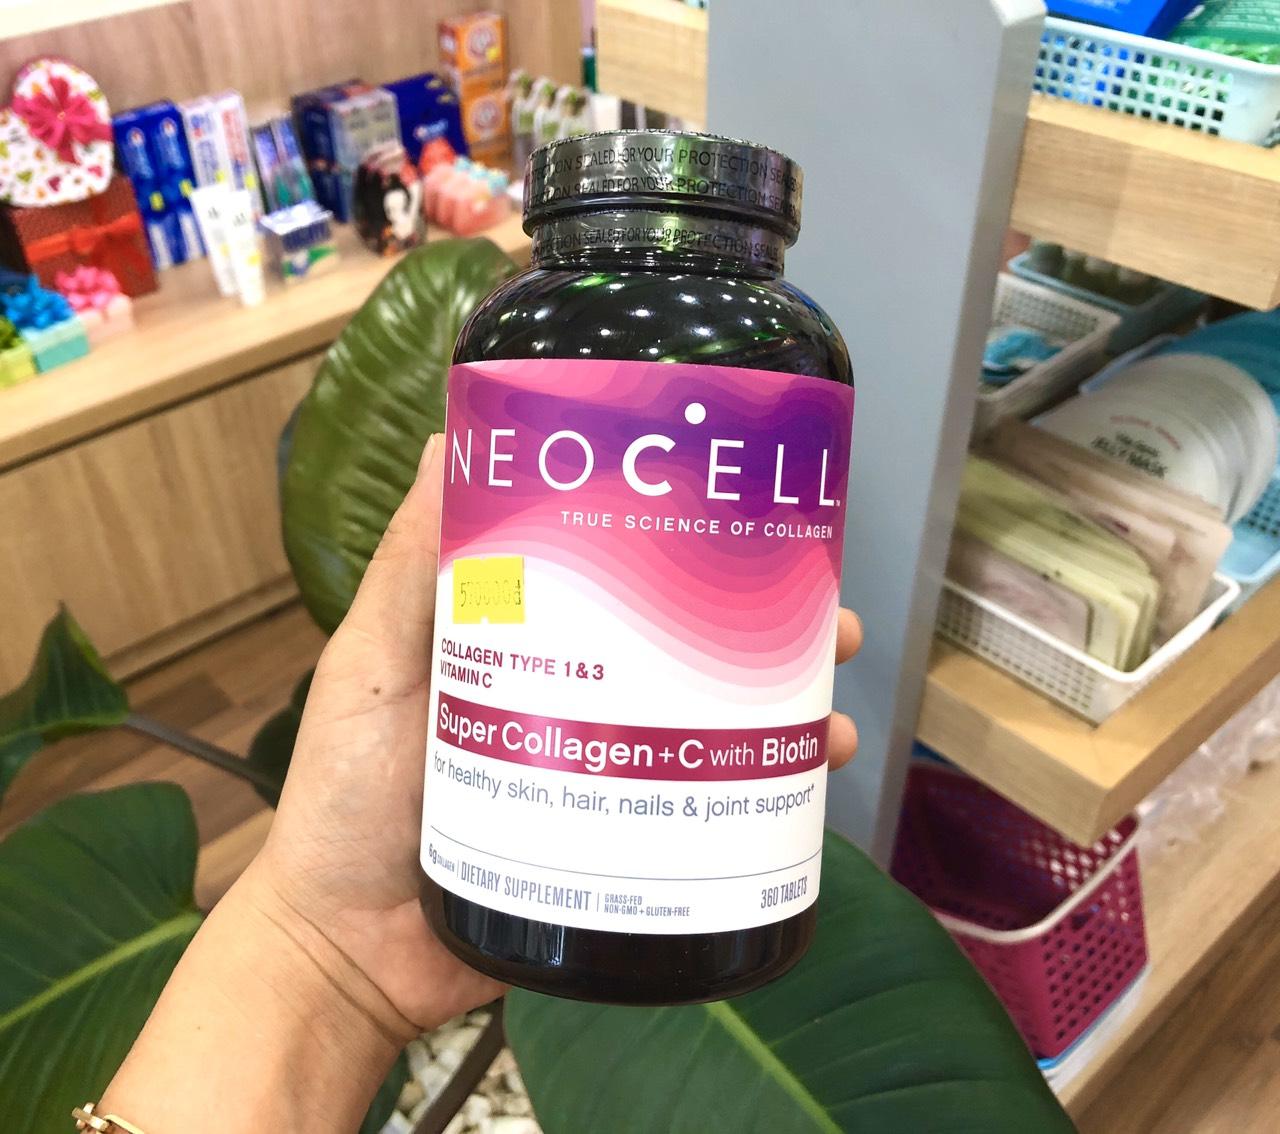 Viên uống Neocell Super Collagen